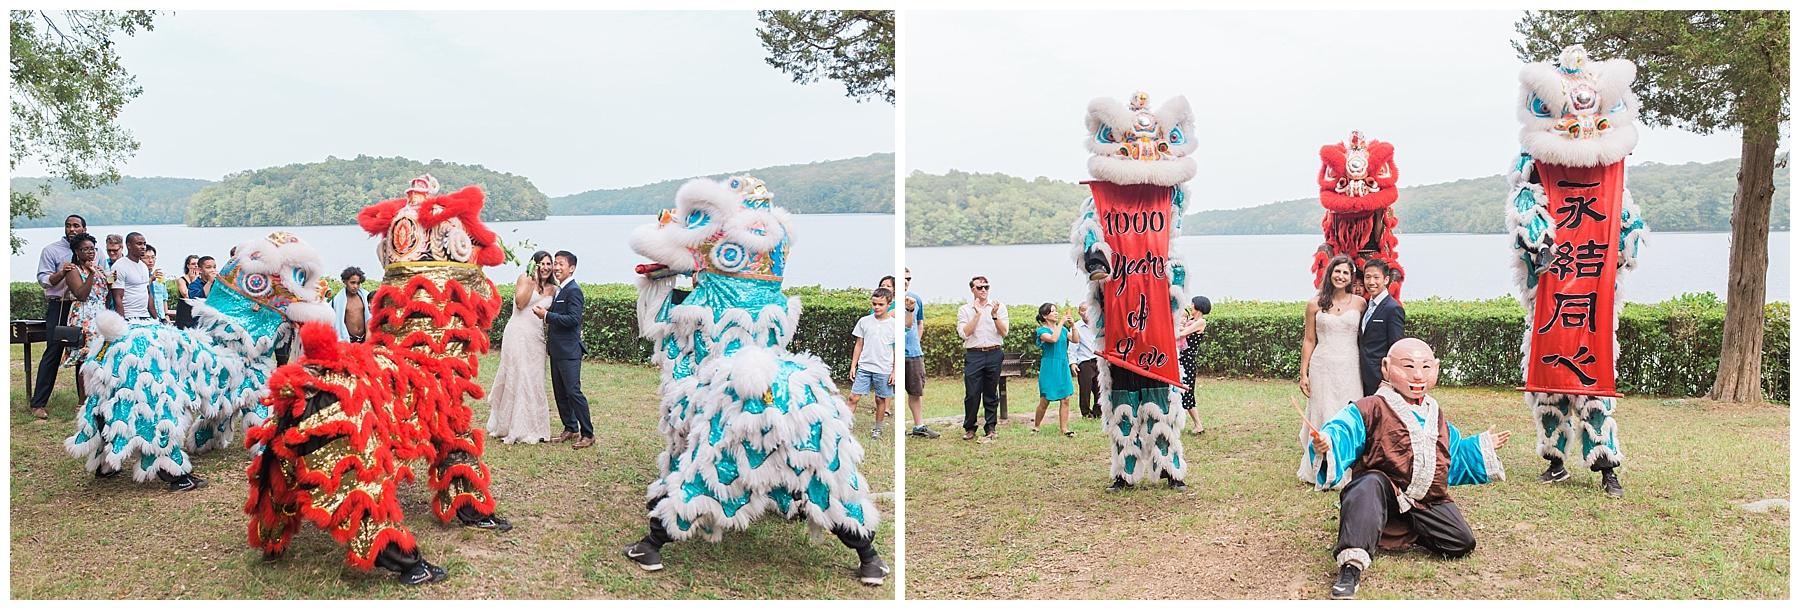 east lyme connecticut wedding photographer